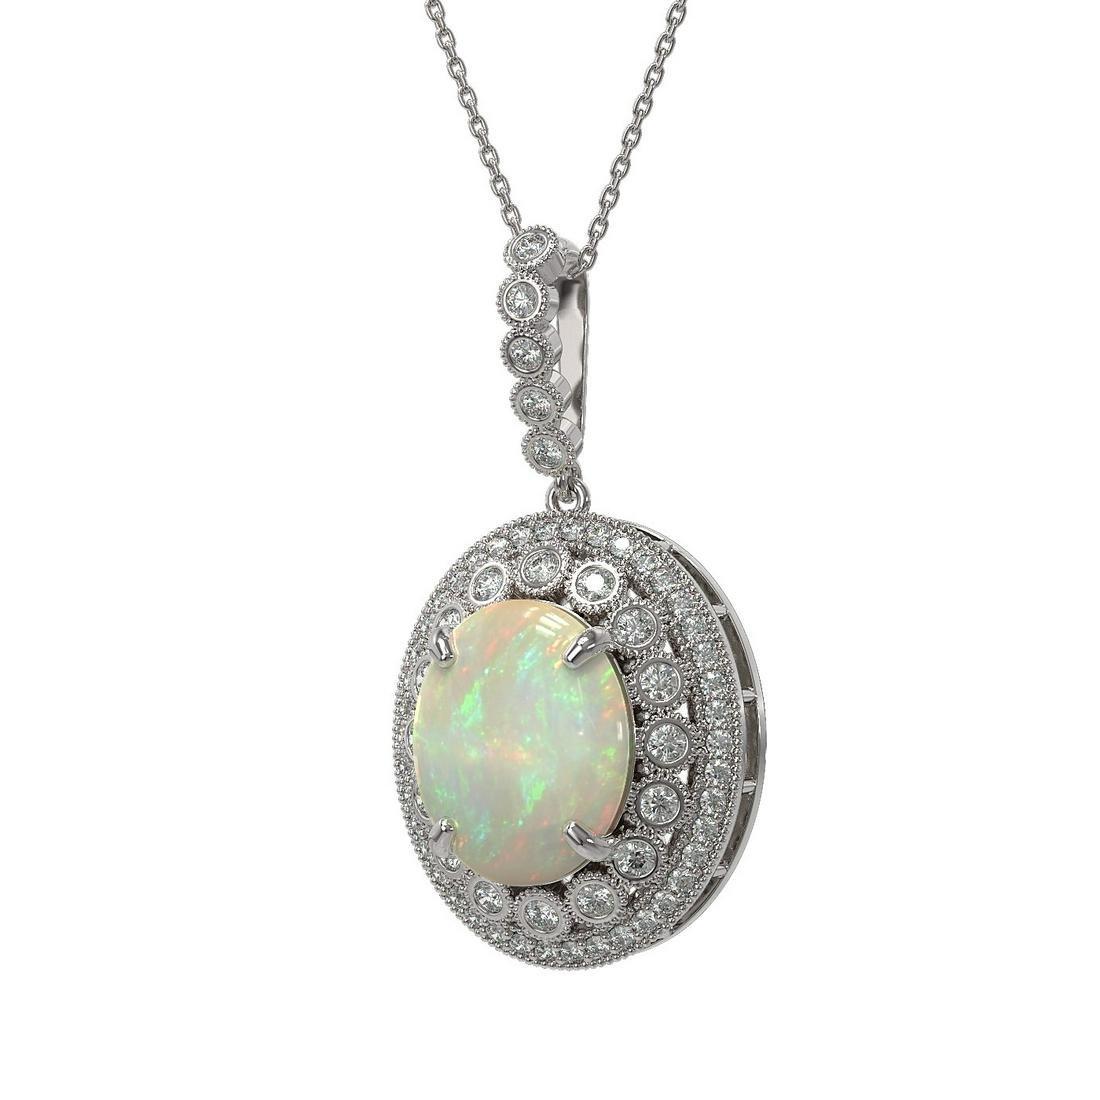 9.38 ctw Certified Opal & Diamond Victorian Necklace